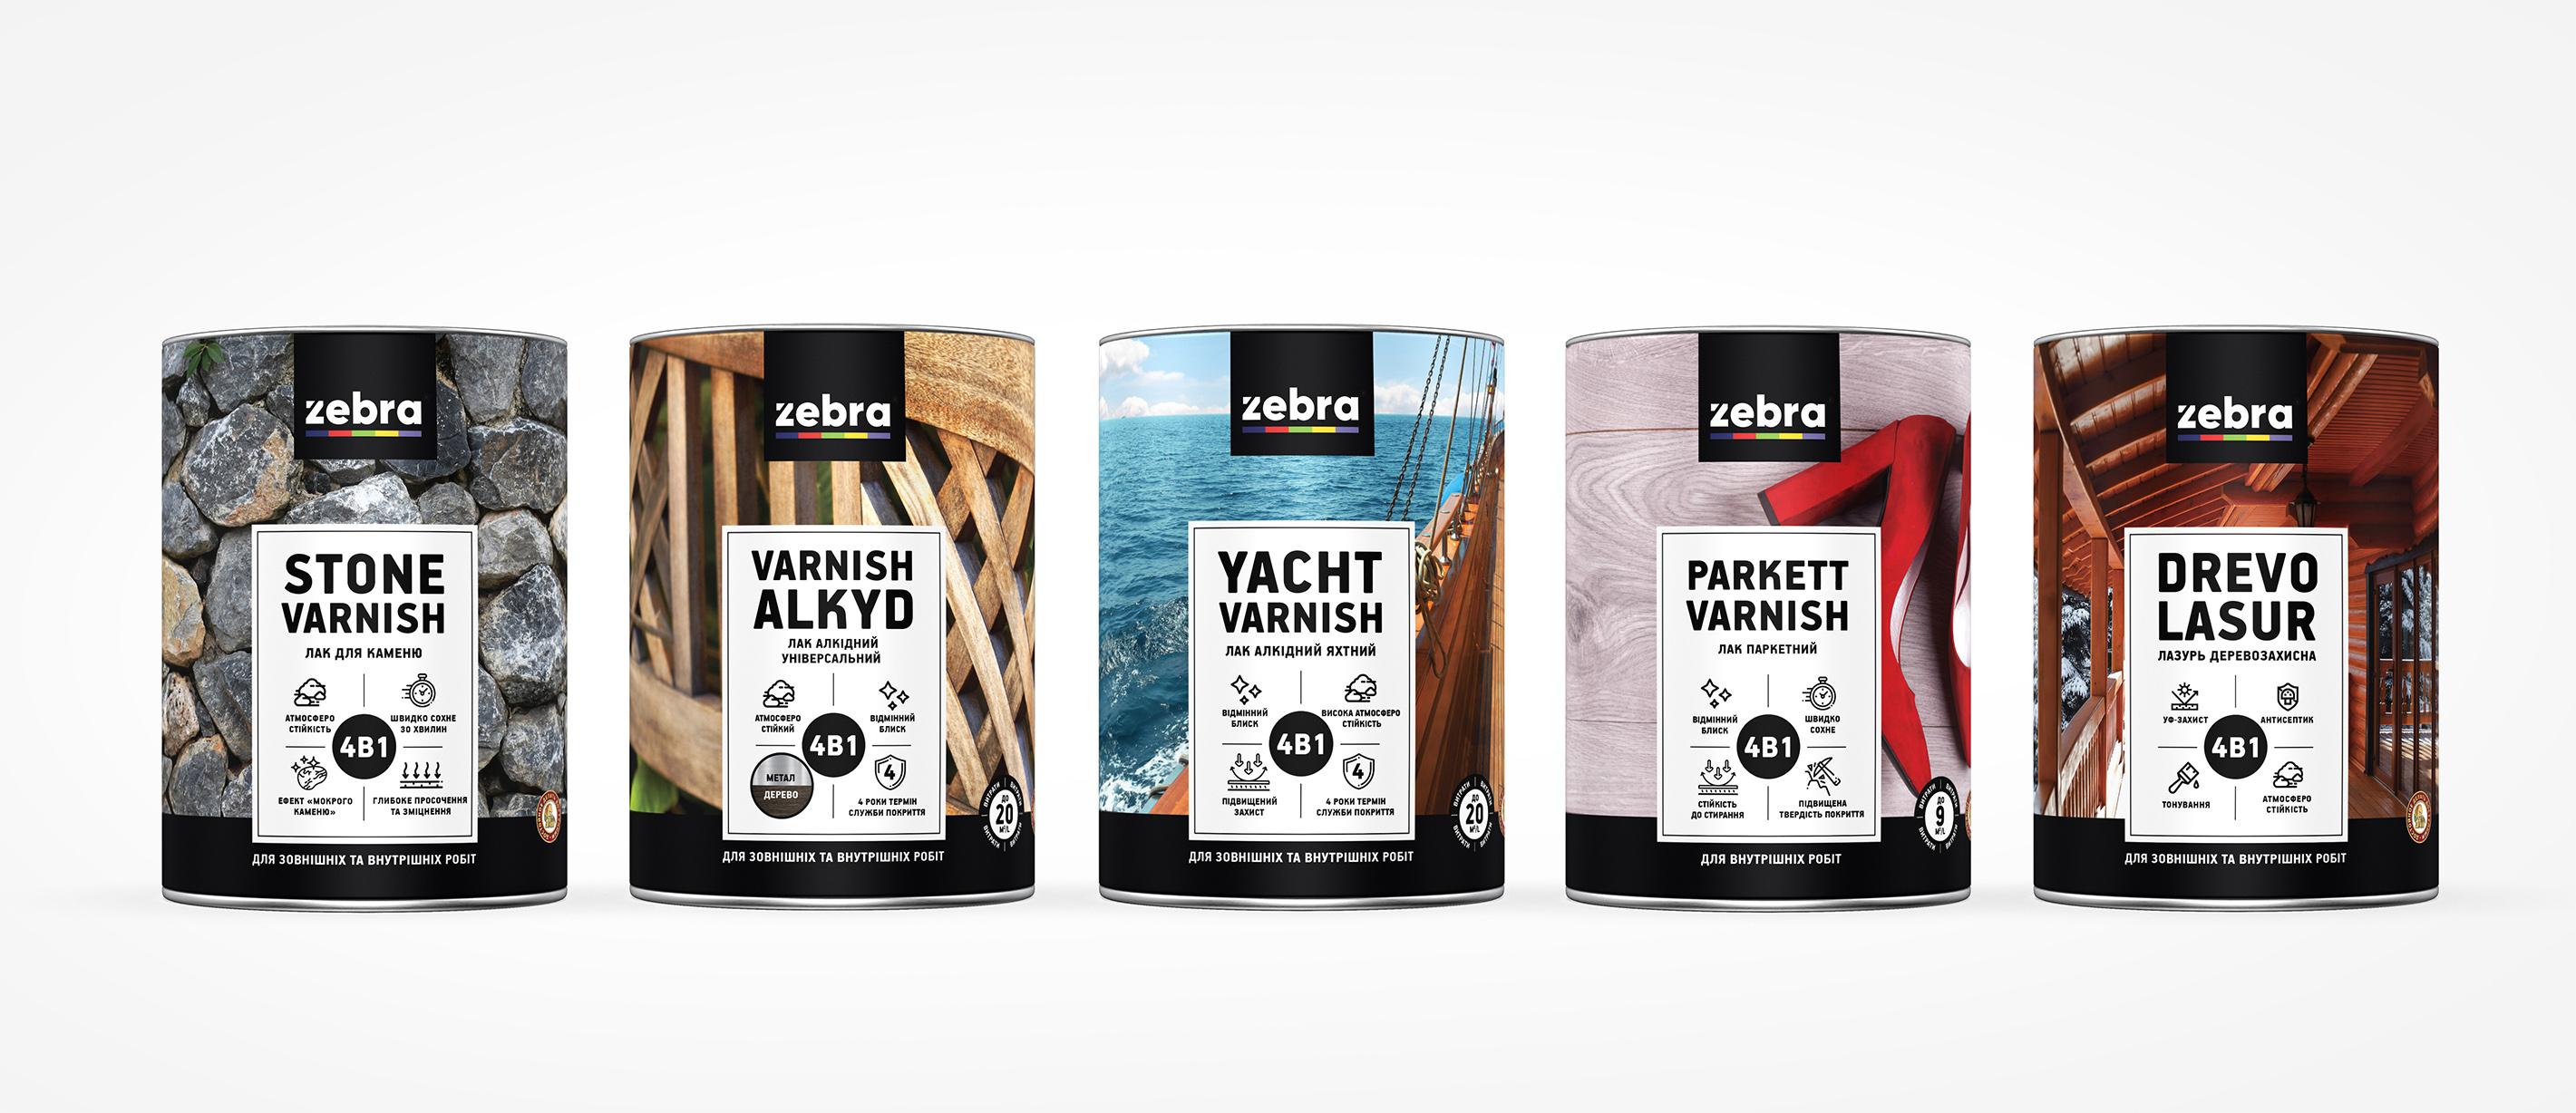 Olga Takhtarova Created the Zebra Paint and Varnish Manufacturer Rebranding